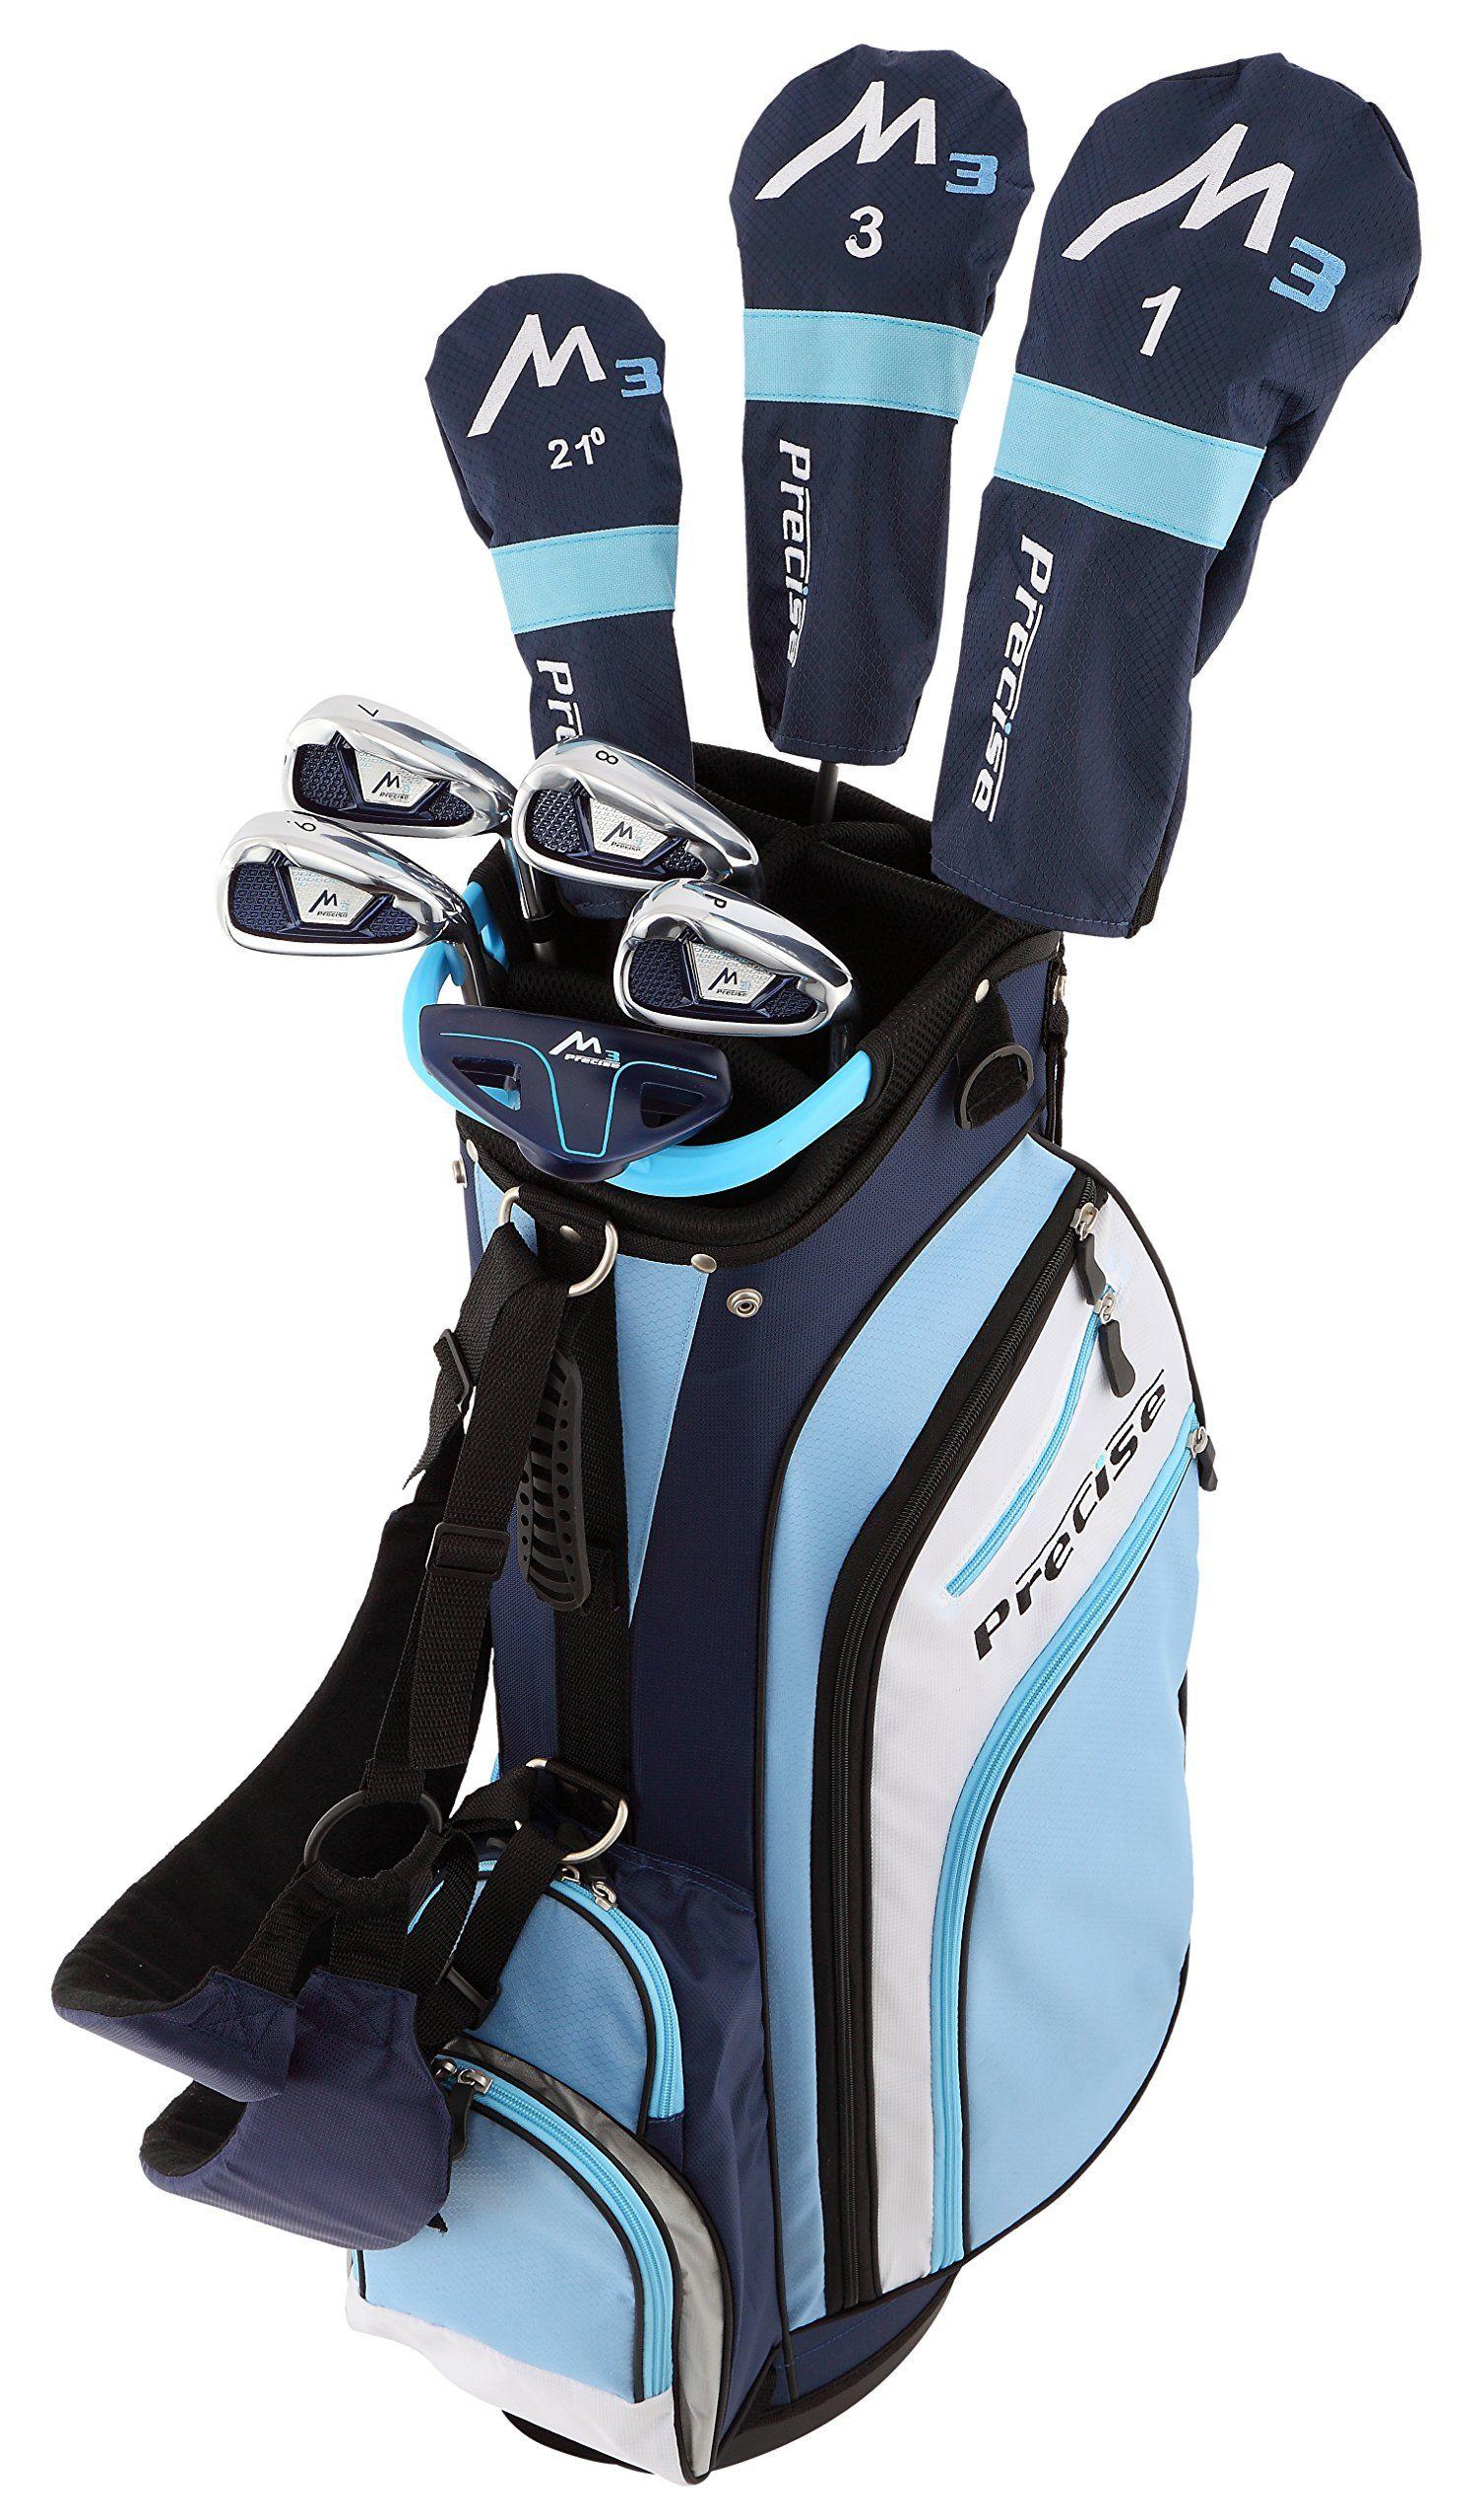 Golf clubs precise m3 ladies womens complete golf clubs